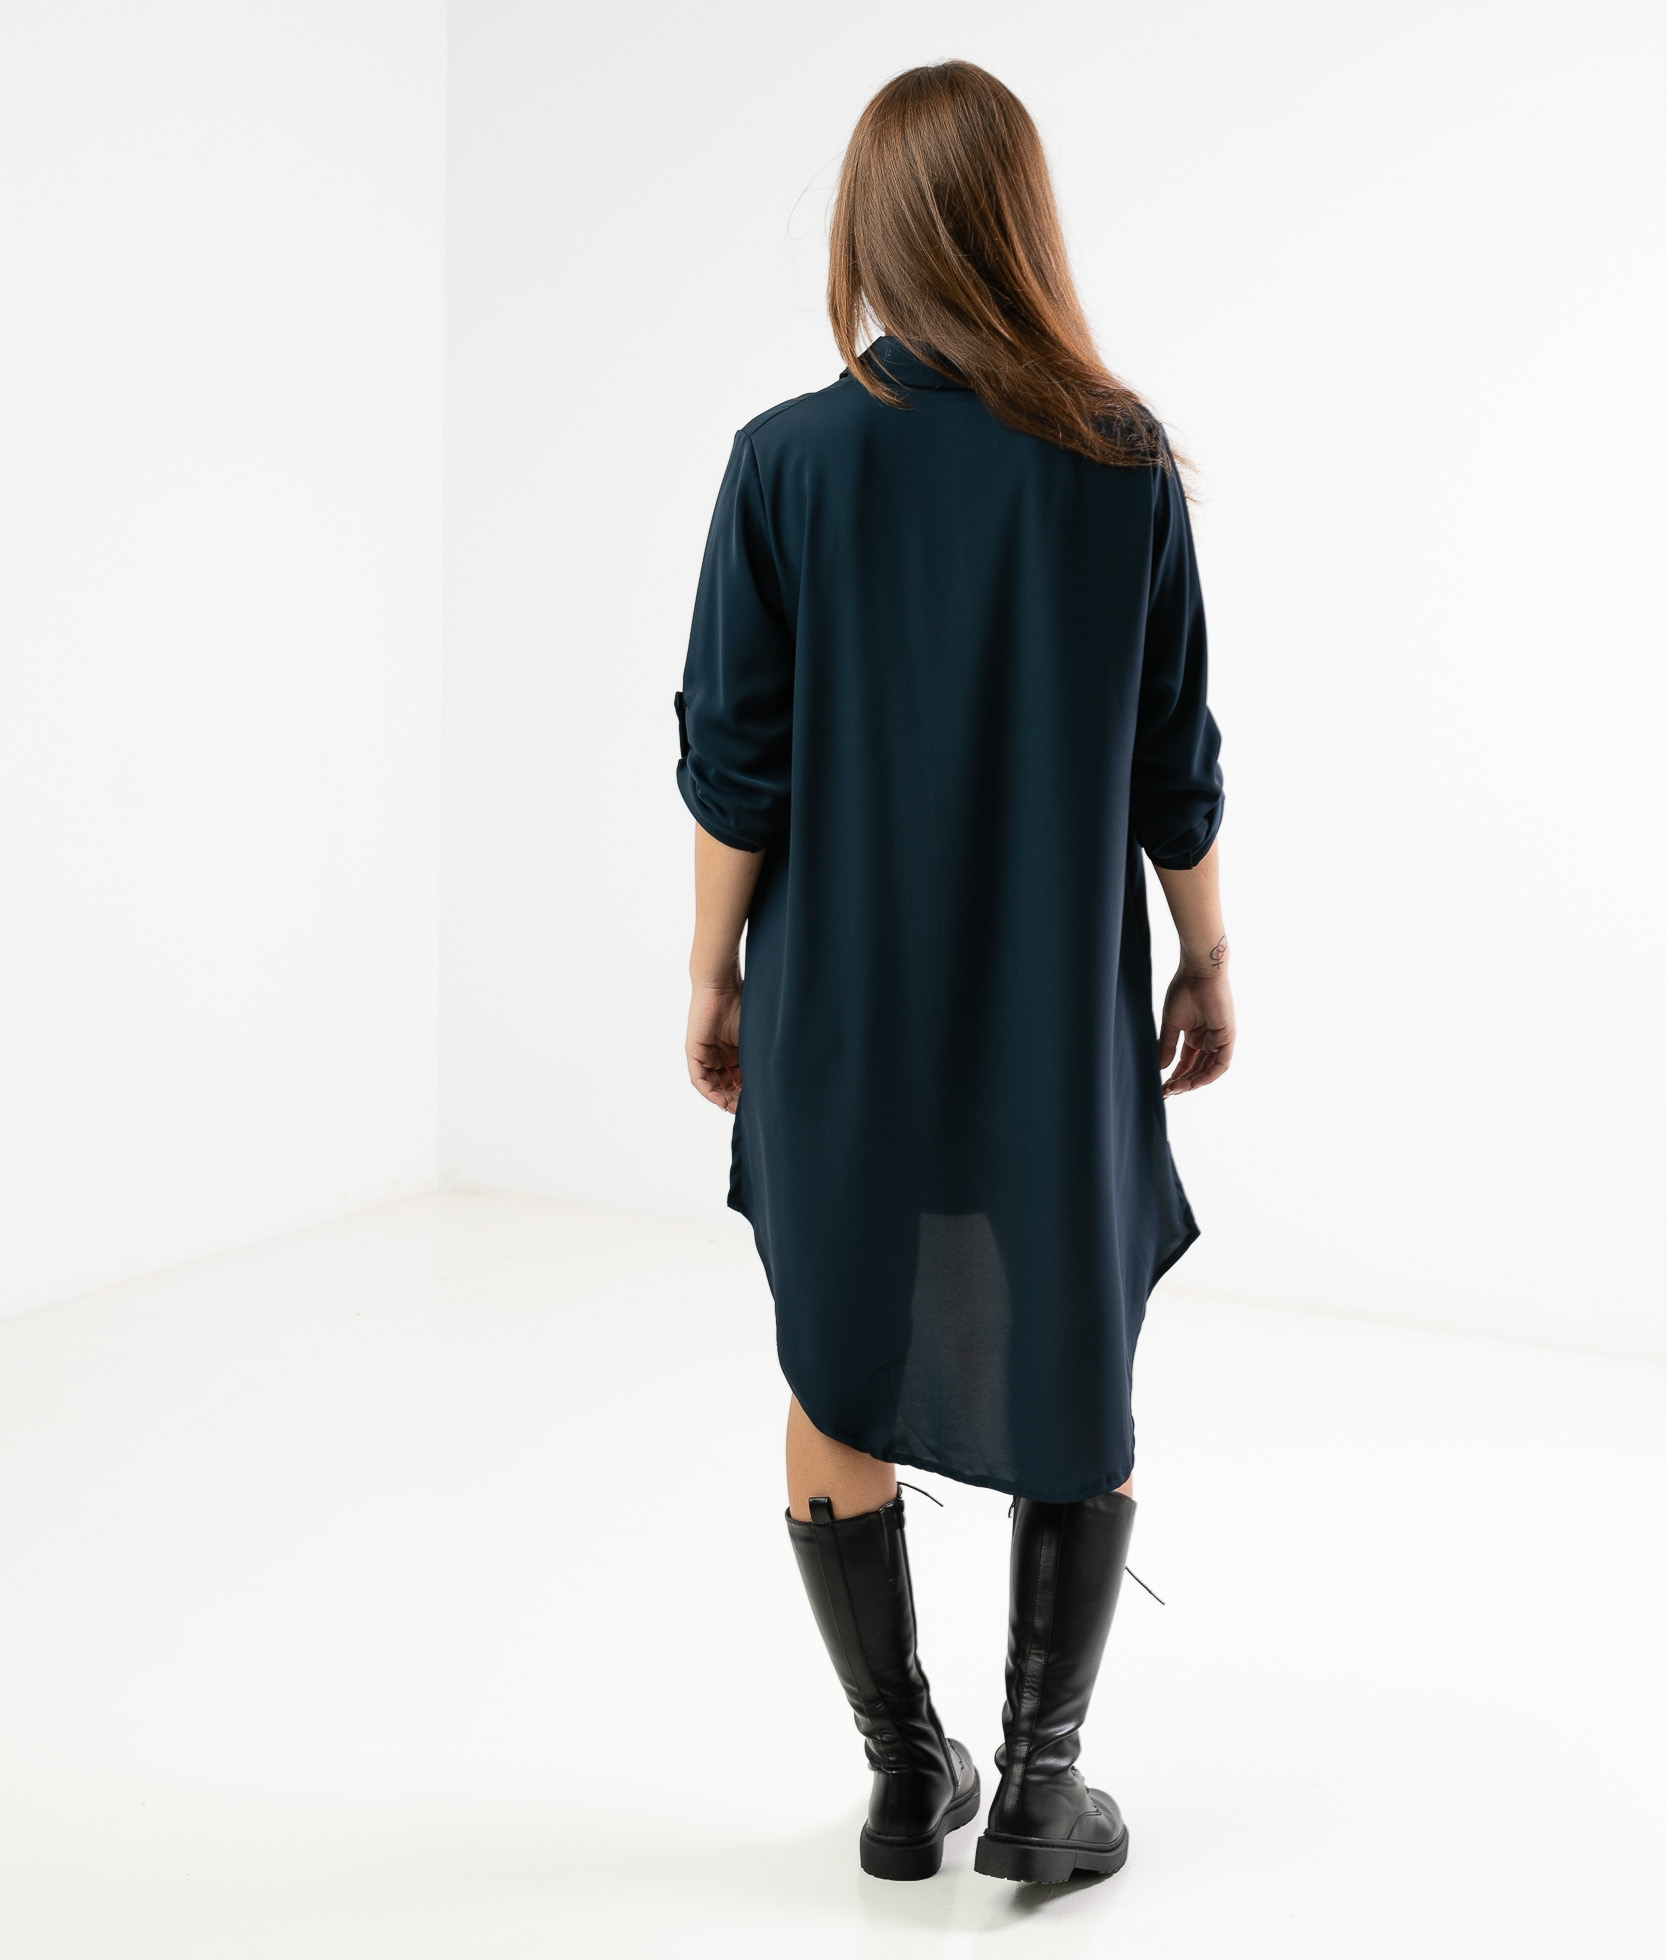 VIMALA DRESS - DARK BLUE